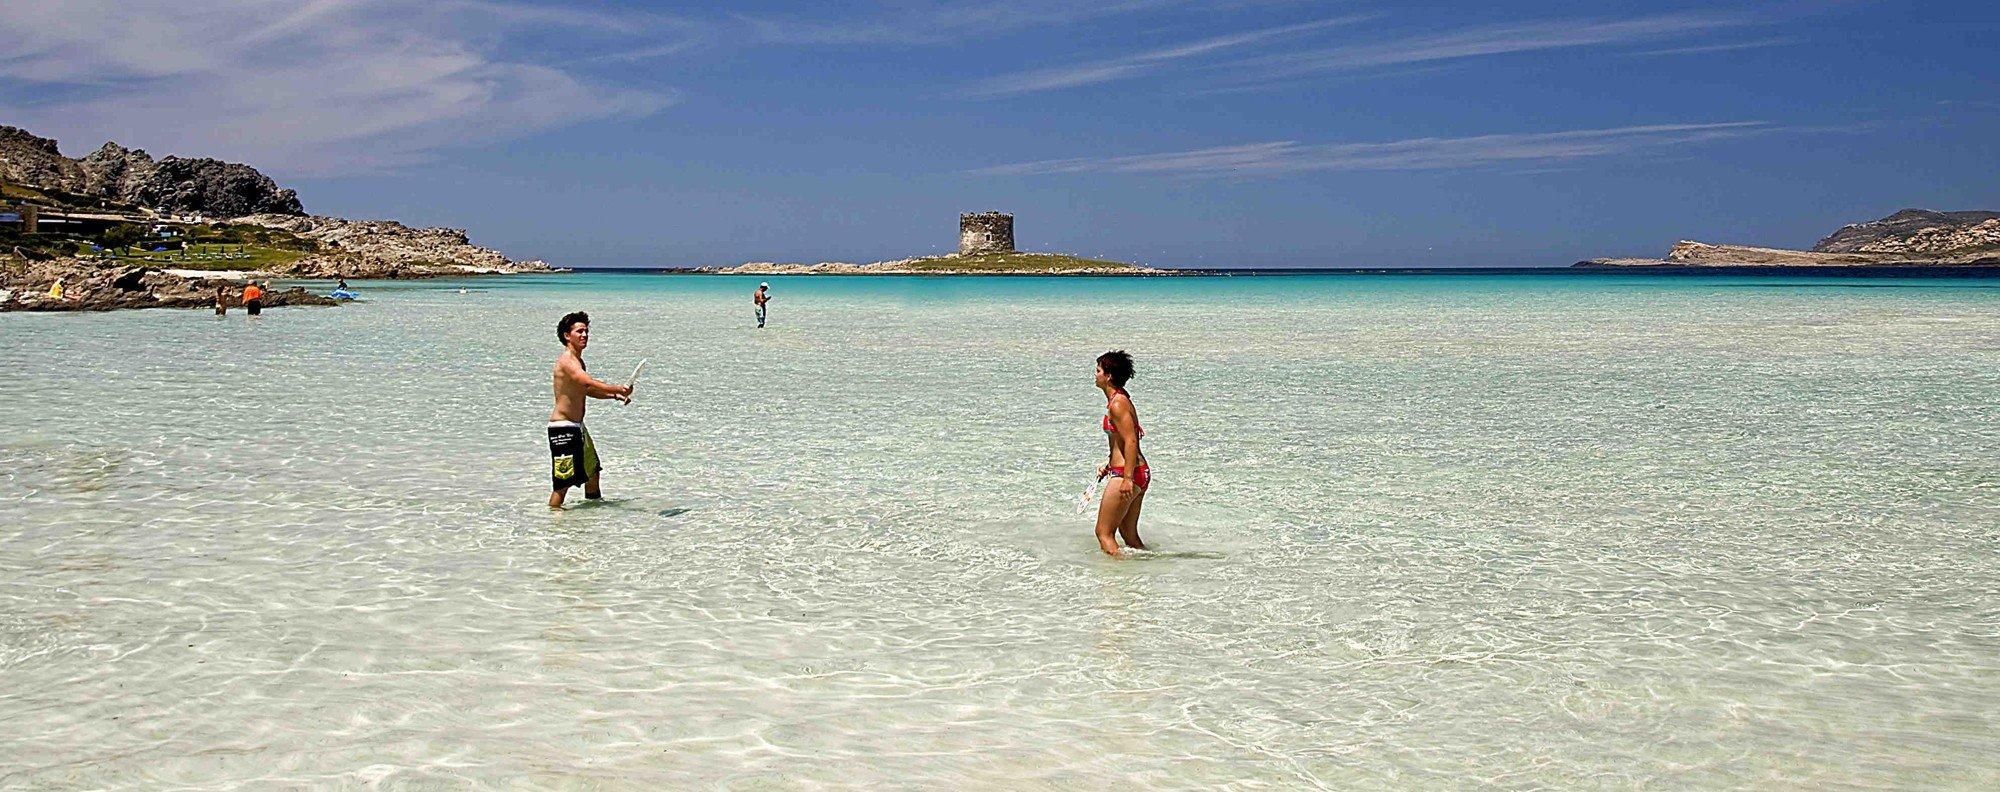 The 10 Best European Beaches Featured In Post Magazine